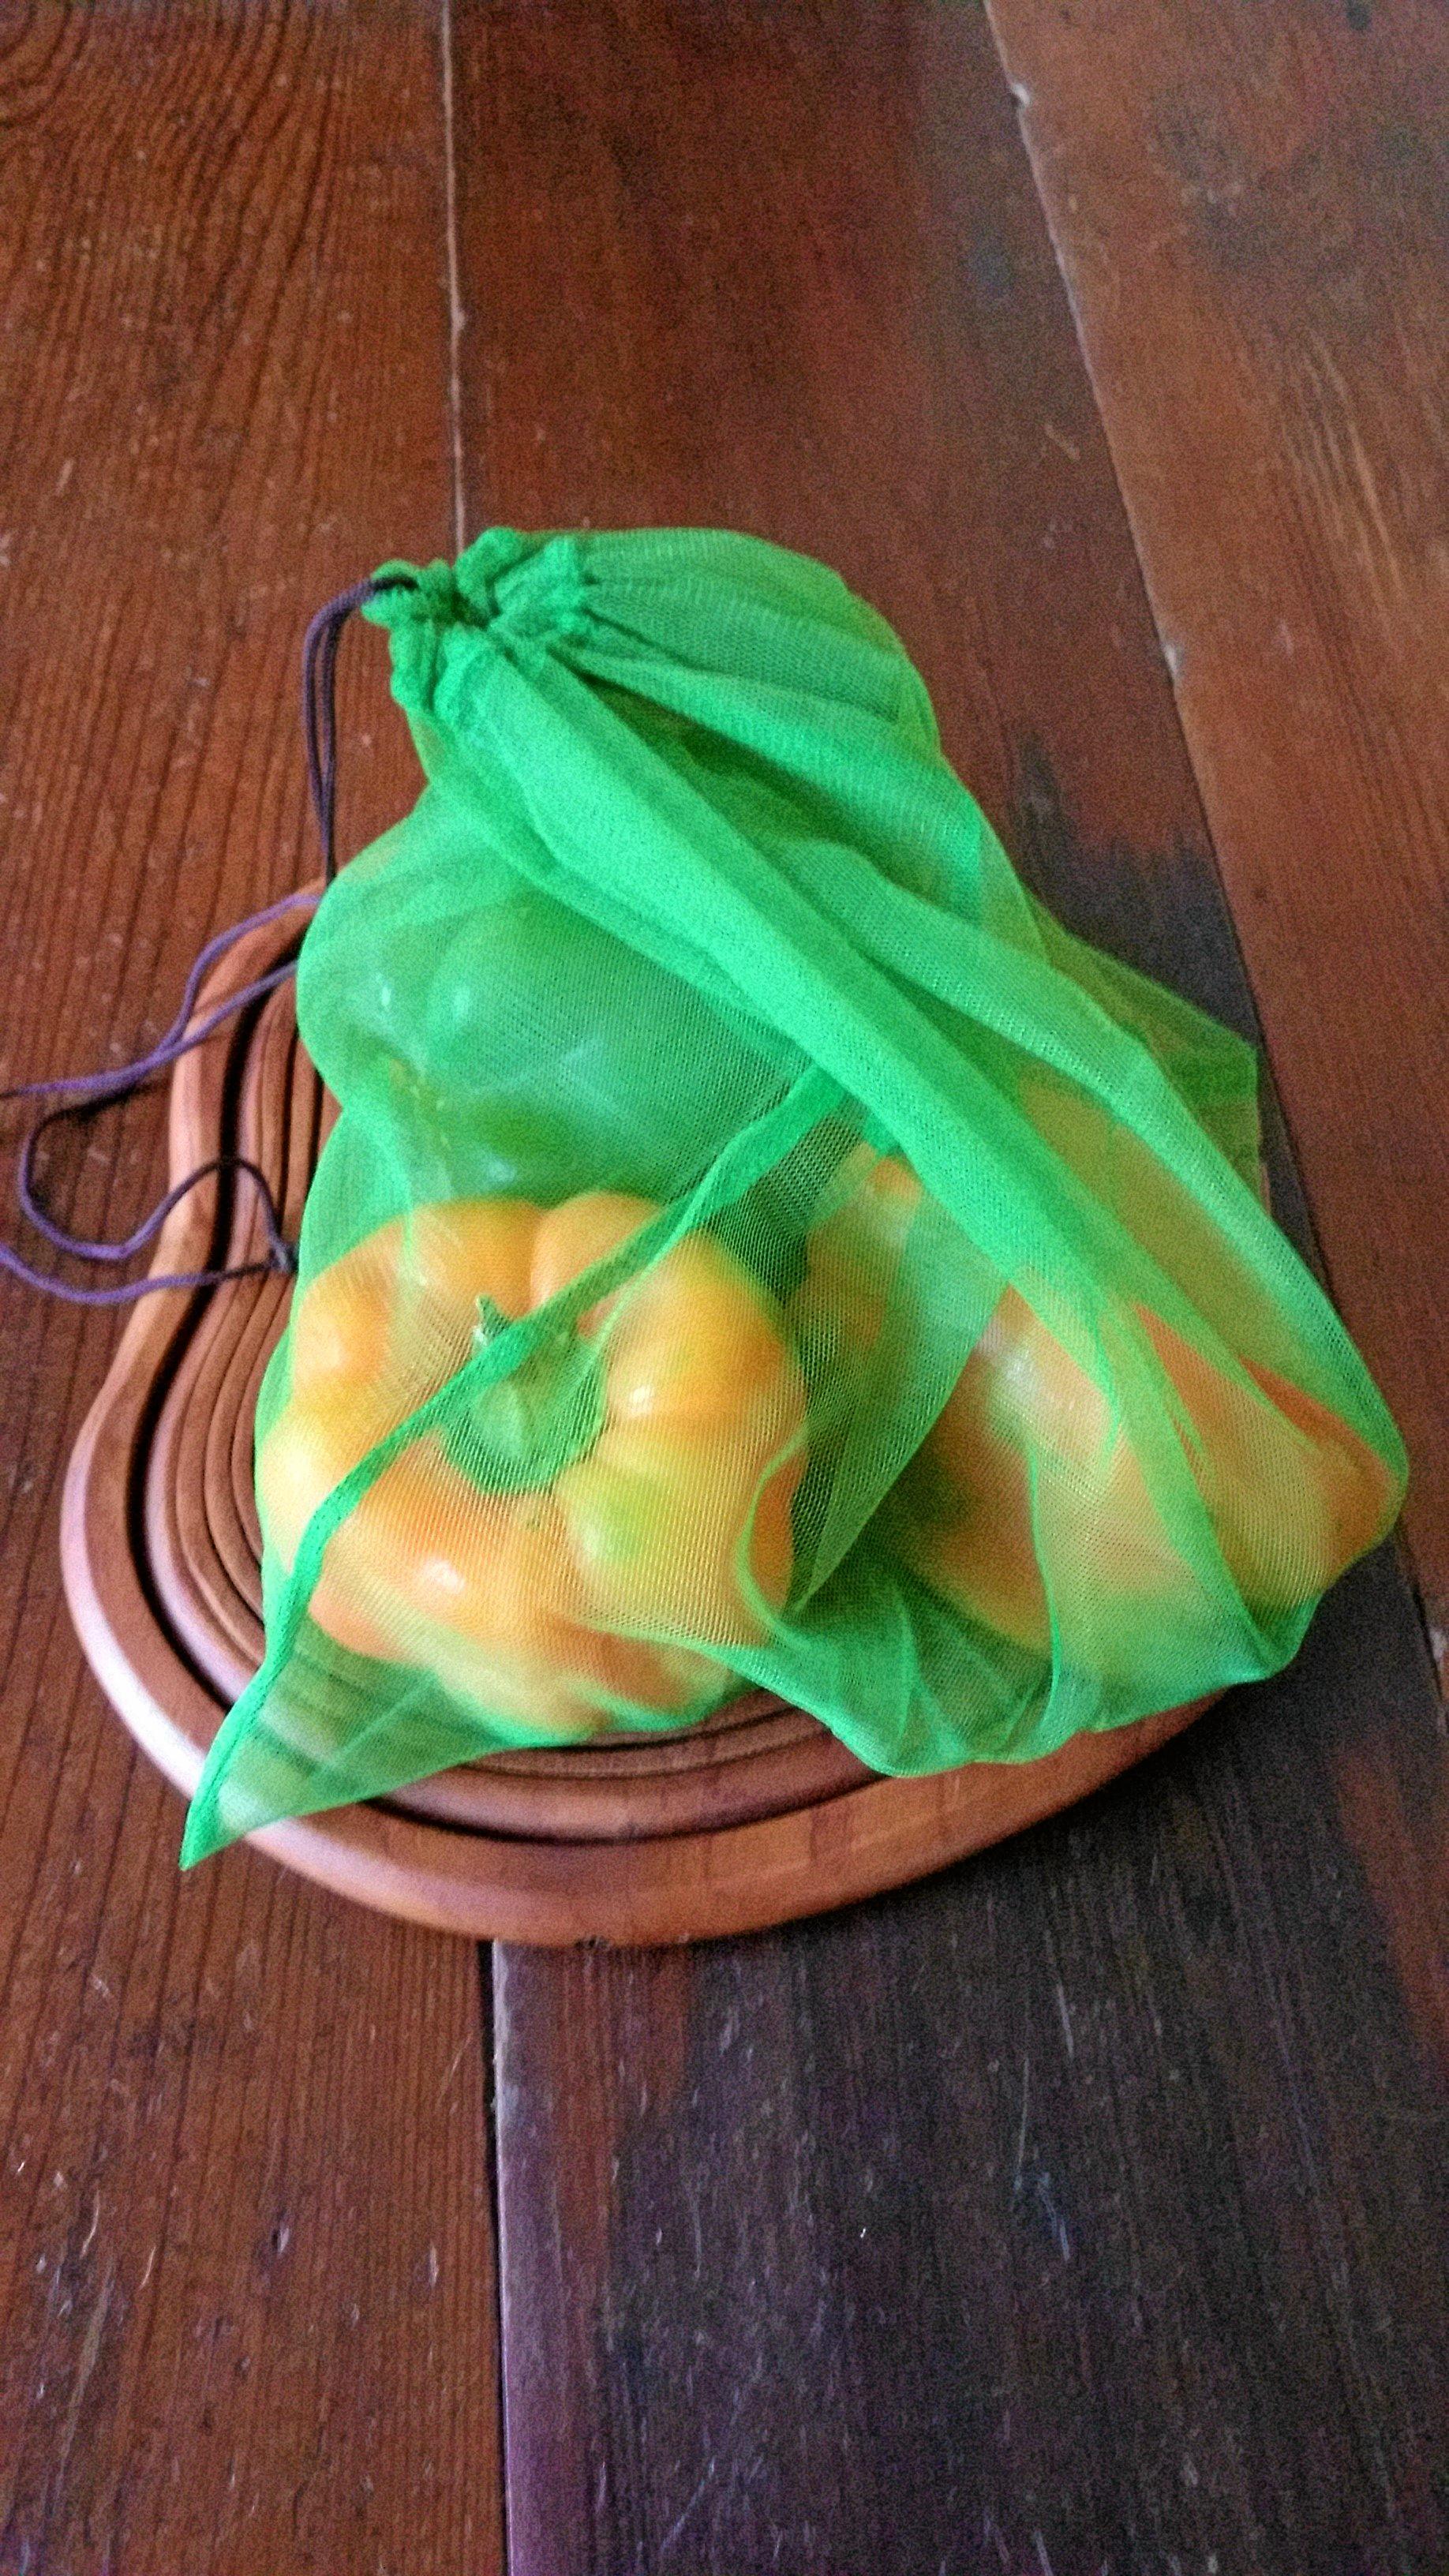 Fruity sacks.